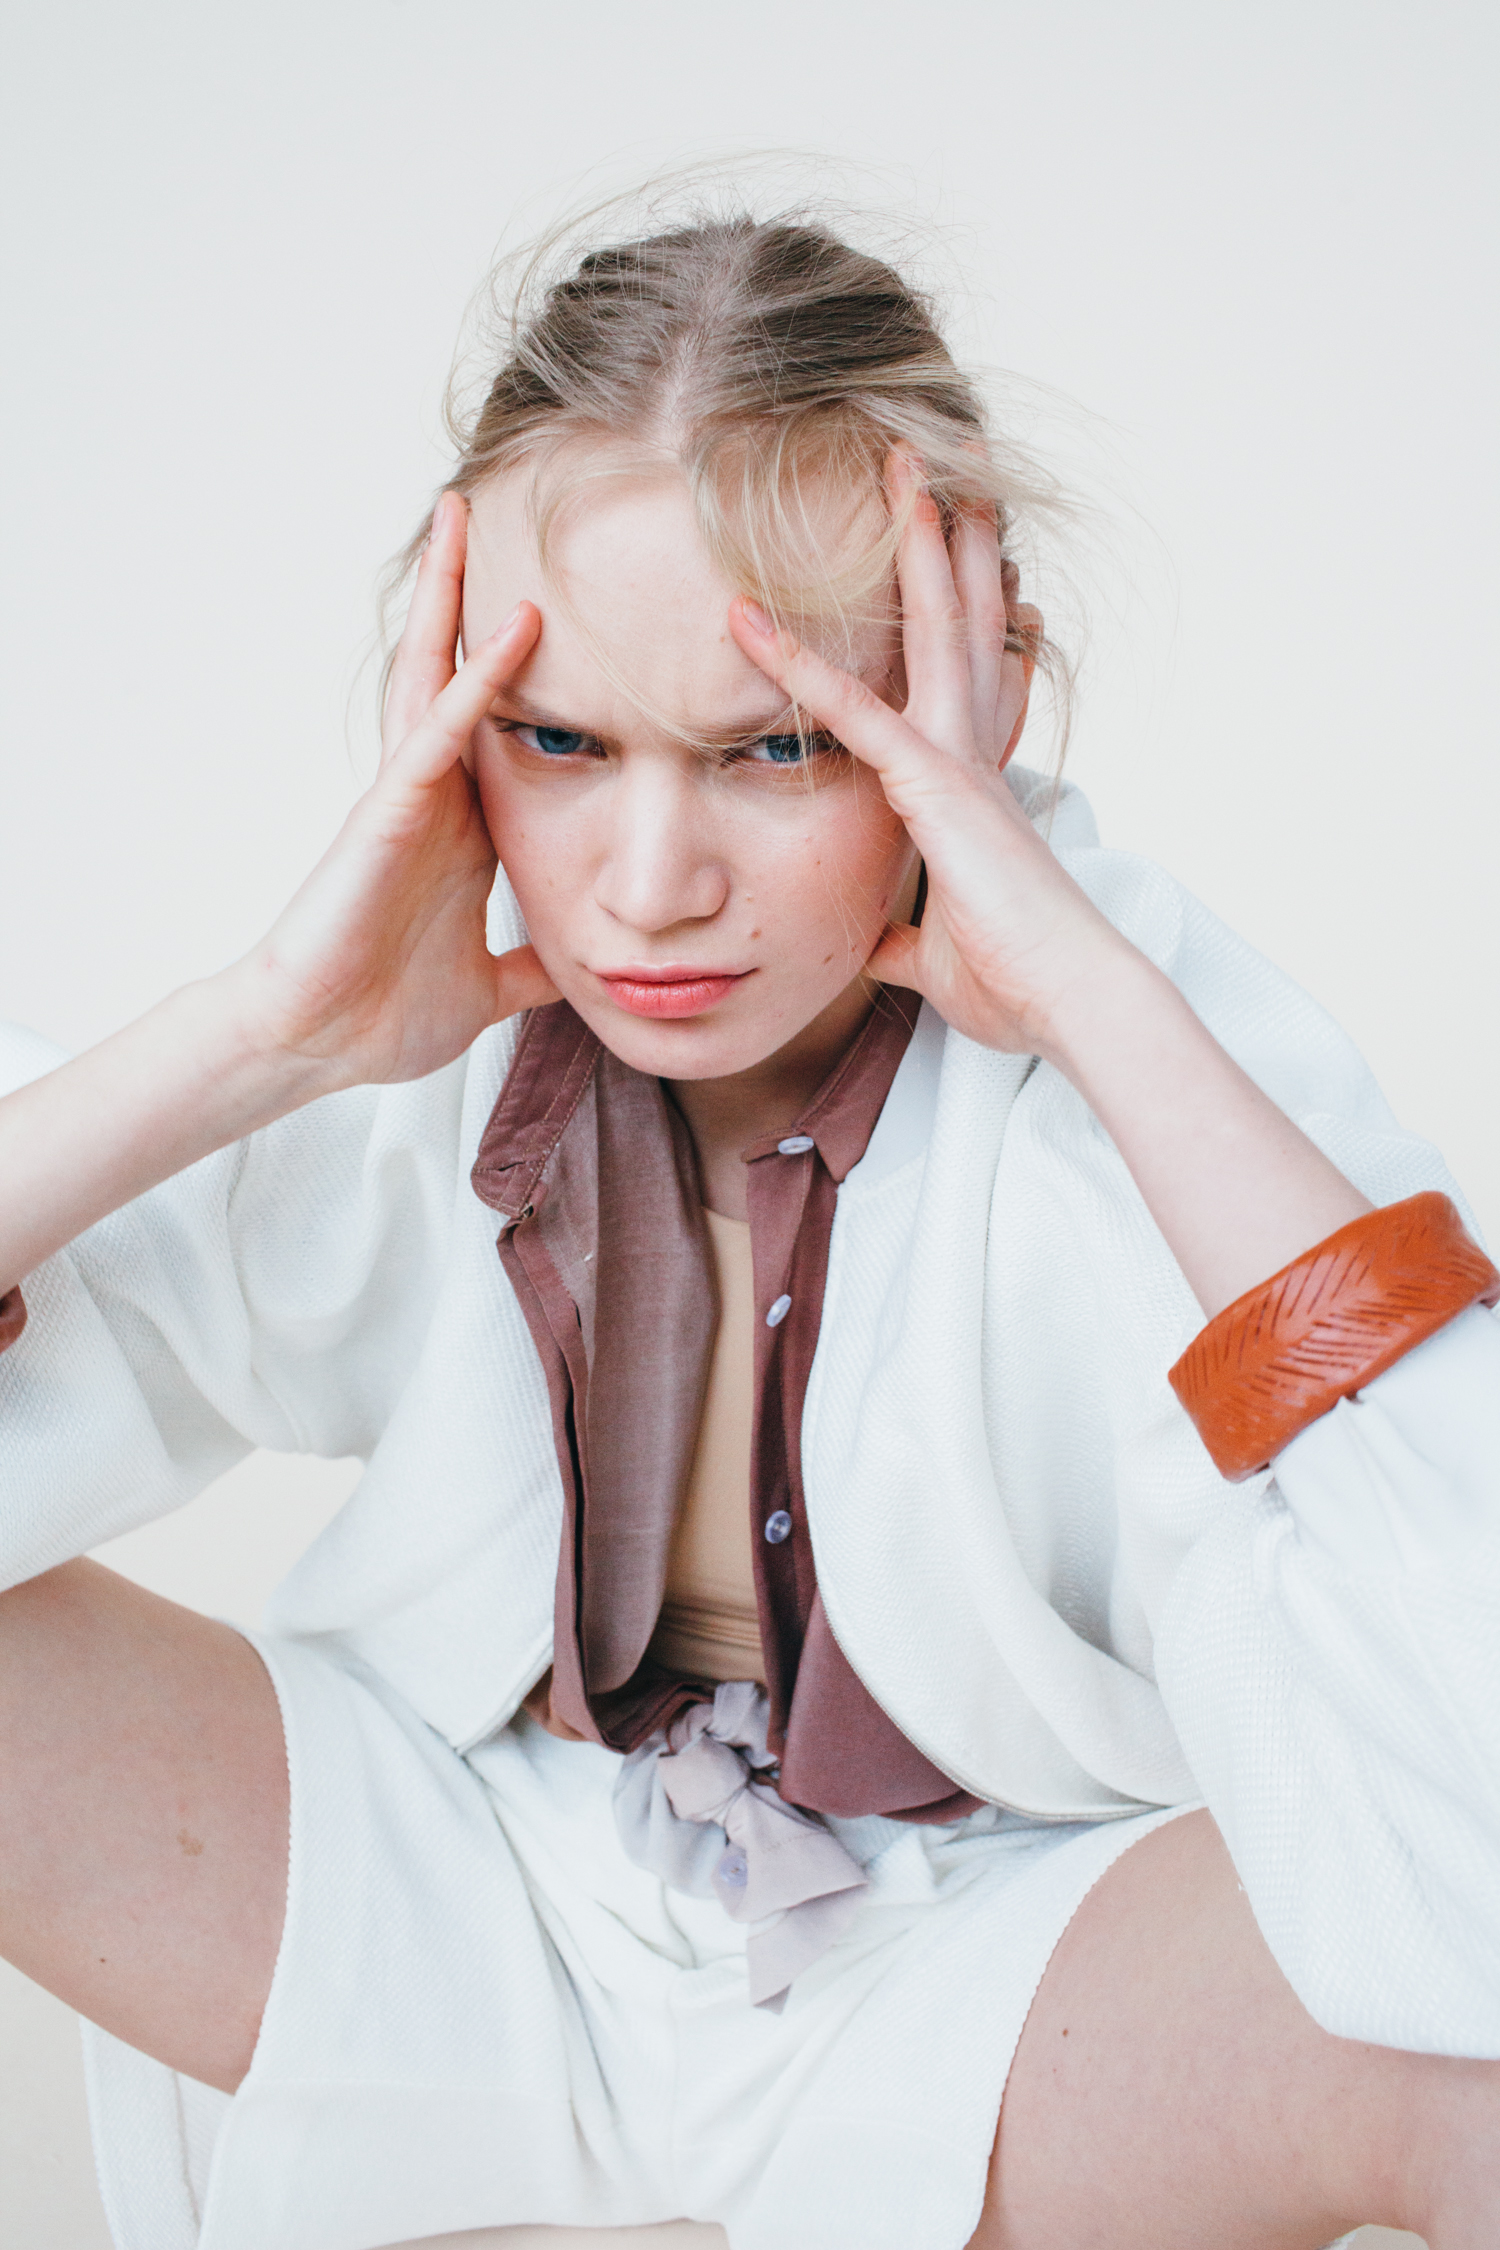 amber_byrne_mahoney_bullet_magazine_editorial_fashion_photography_011.jpg